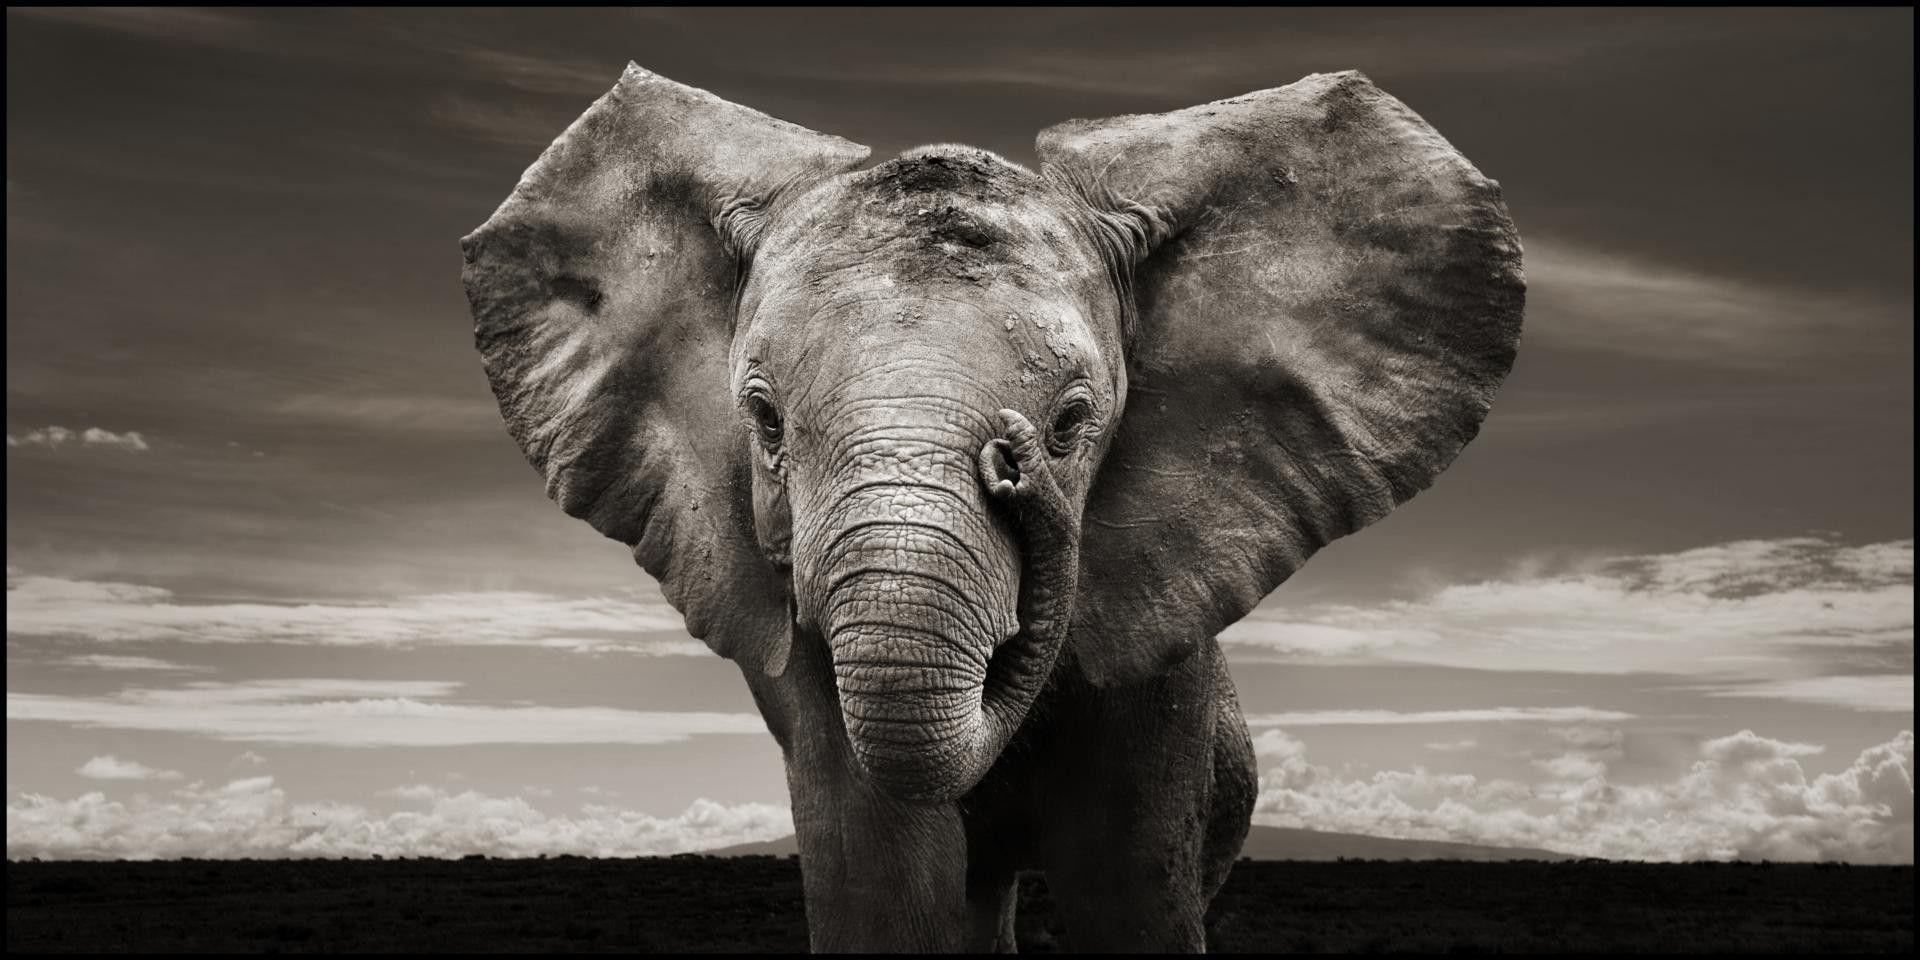 Elephant Computer Wallpapers, Desktop Backgrounds 1920x960 Id: 193044